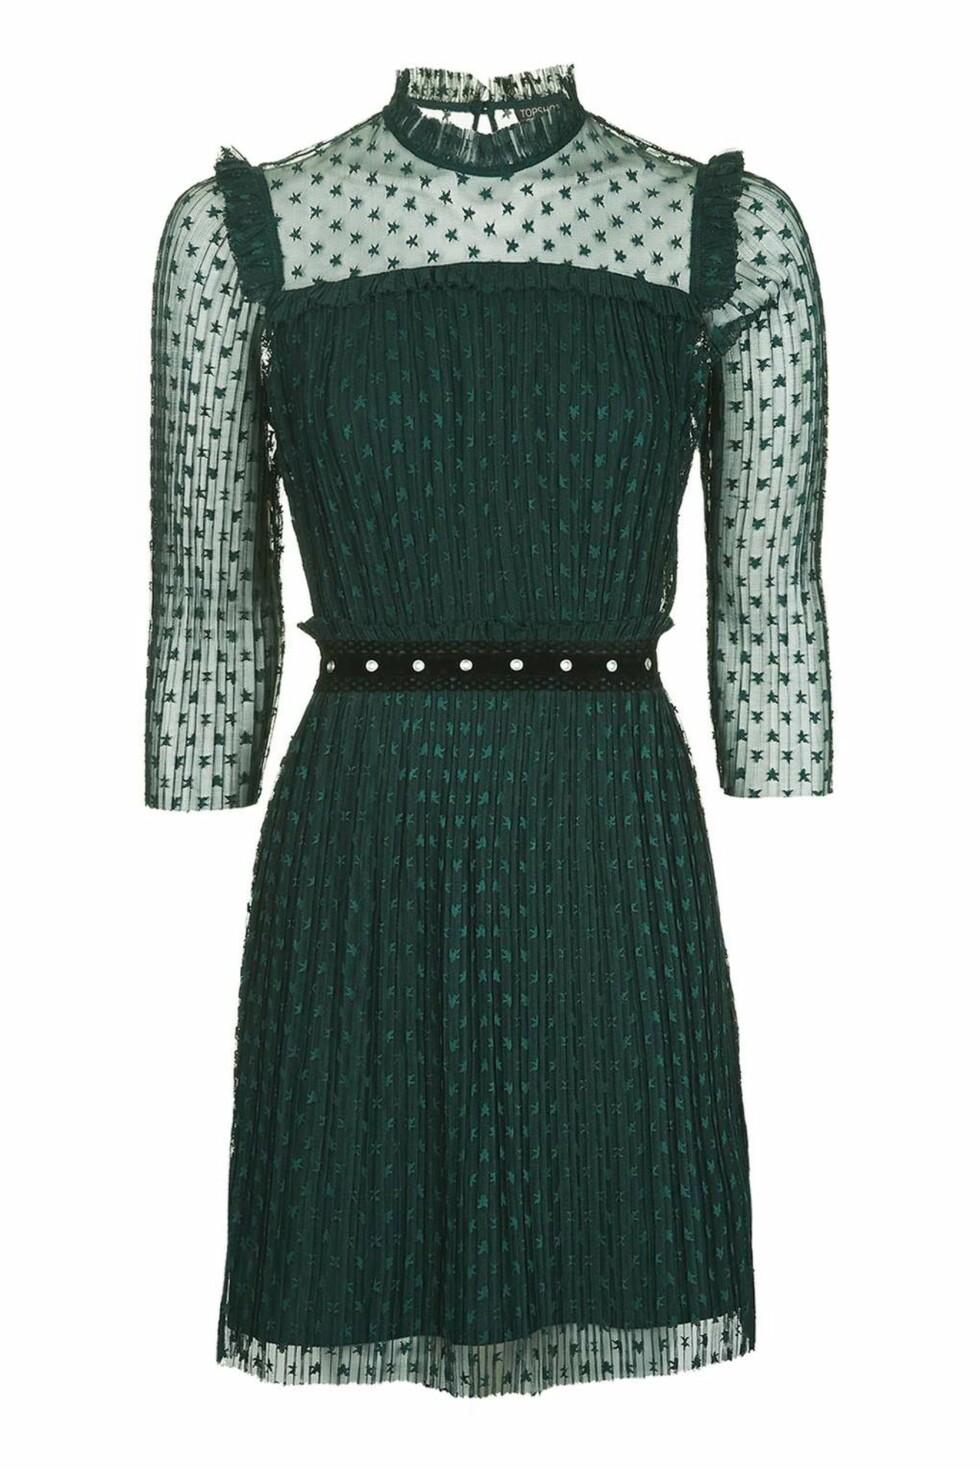 <strong>Kjole fra Topshop   kr 443   http:</strong>//www.topshop.com/en/tsuk/product/clothing-427/dresses-442/plisse-star-mesh-skater-dress-5983011?bi=80&ps=20